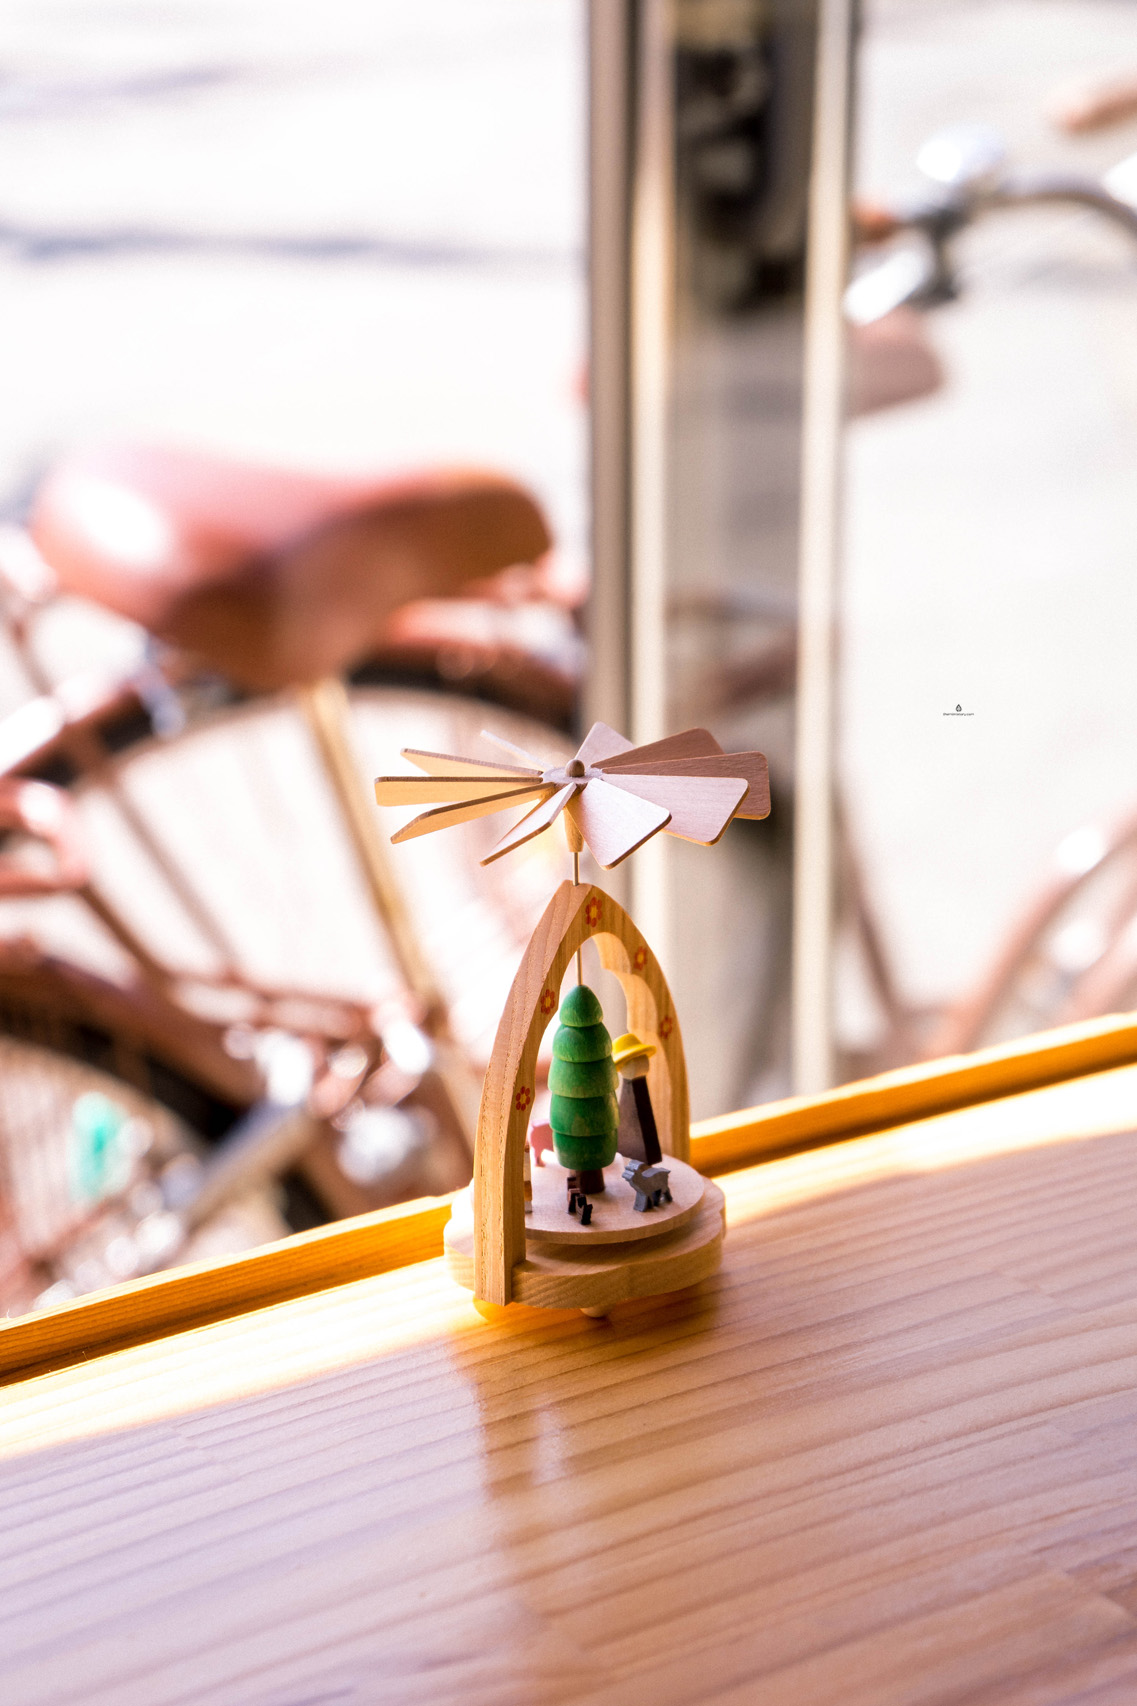 Detail in Kisse Kisse cafe, Takayama